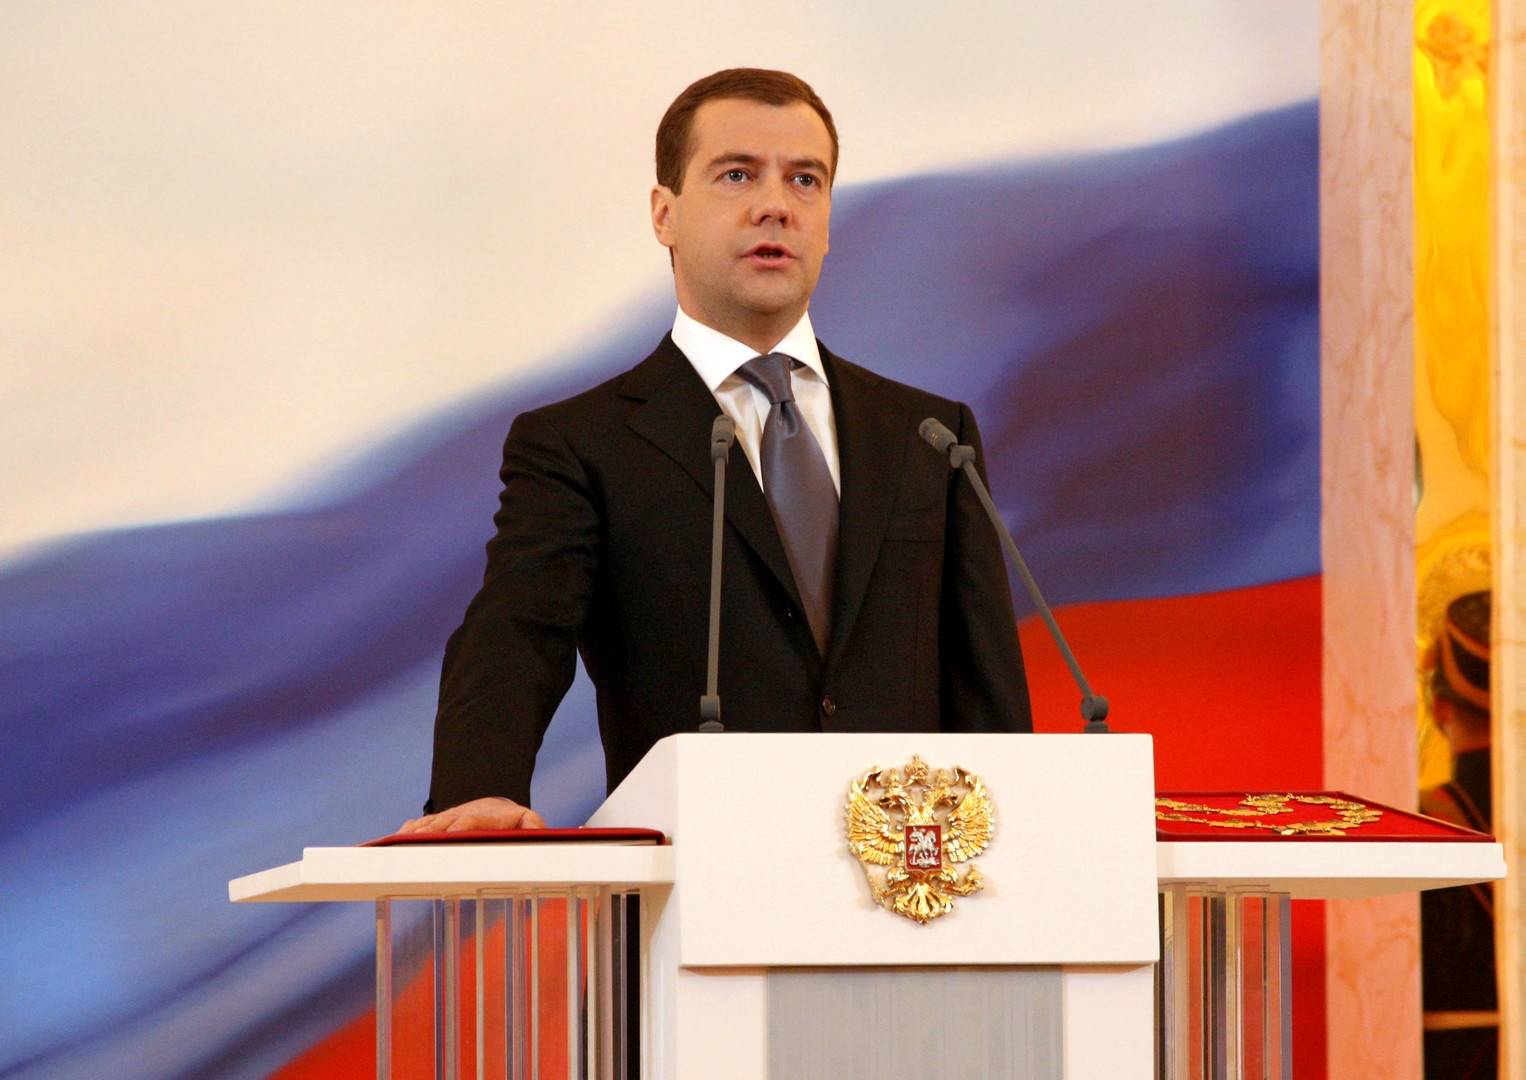 Inauguration_of_Dmitry_Medvedev,_7_May_2008-7.jpg (500×334)